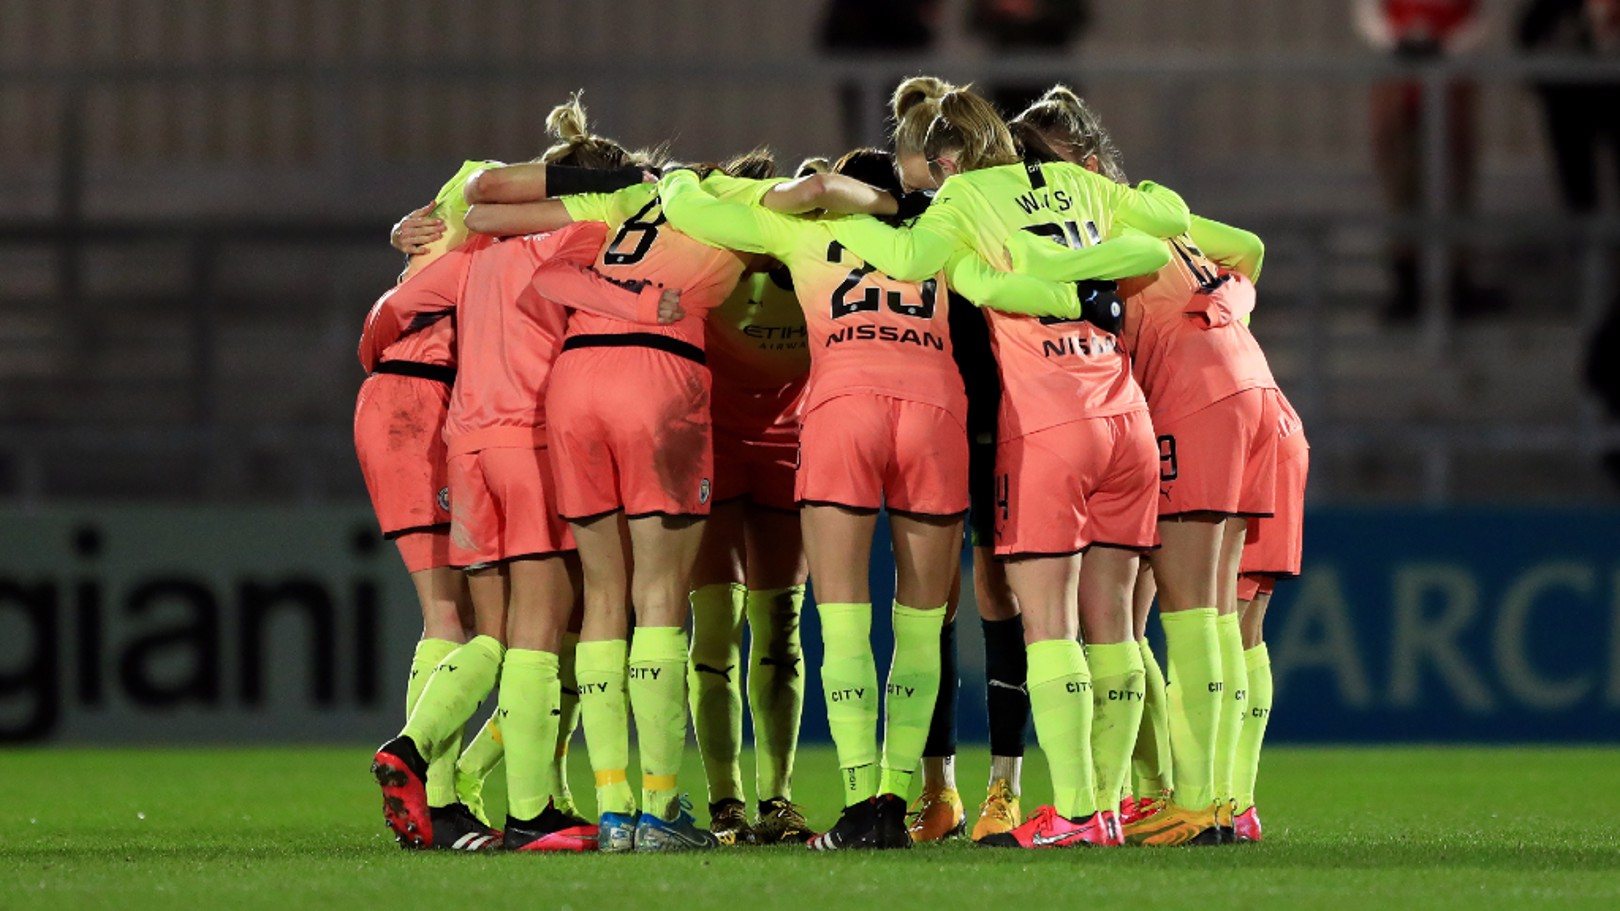 POSTPONED: City's game against West Ham Women has been postponed